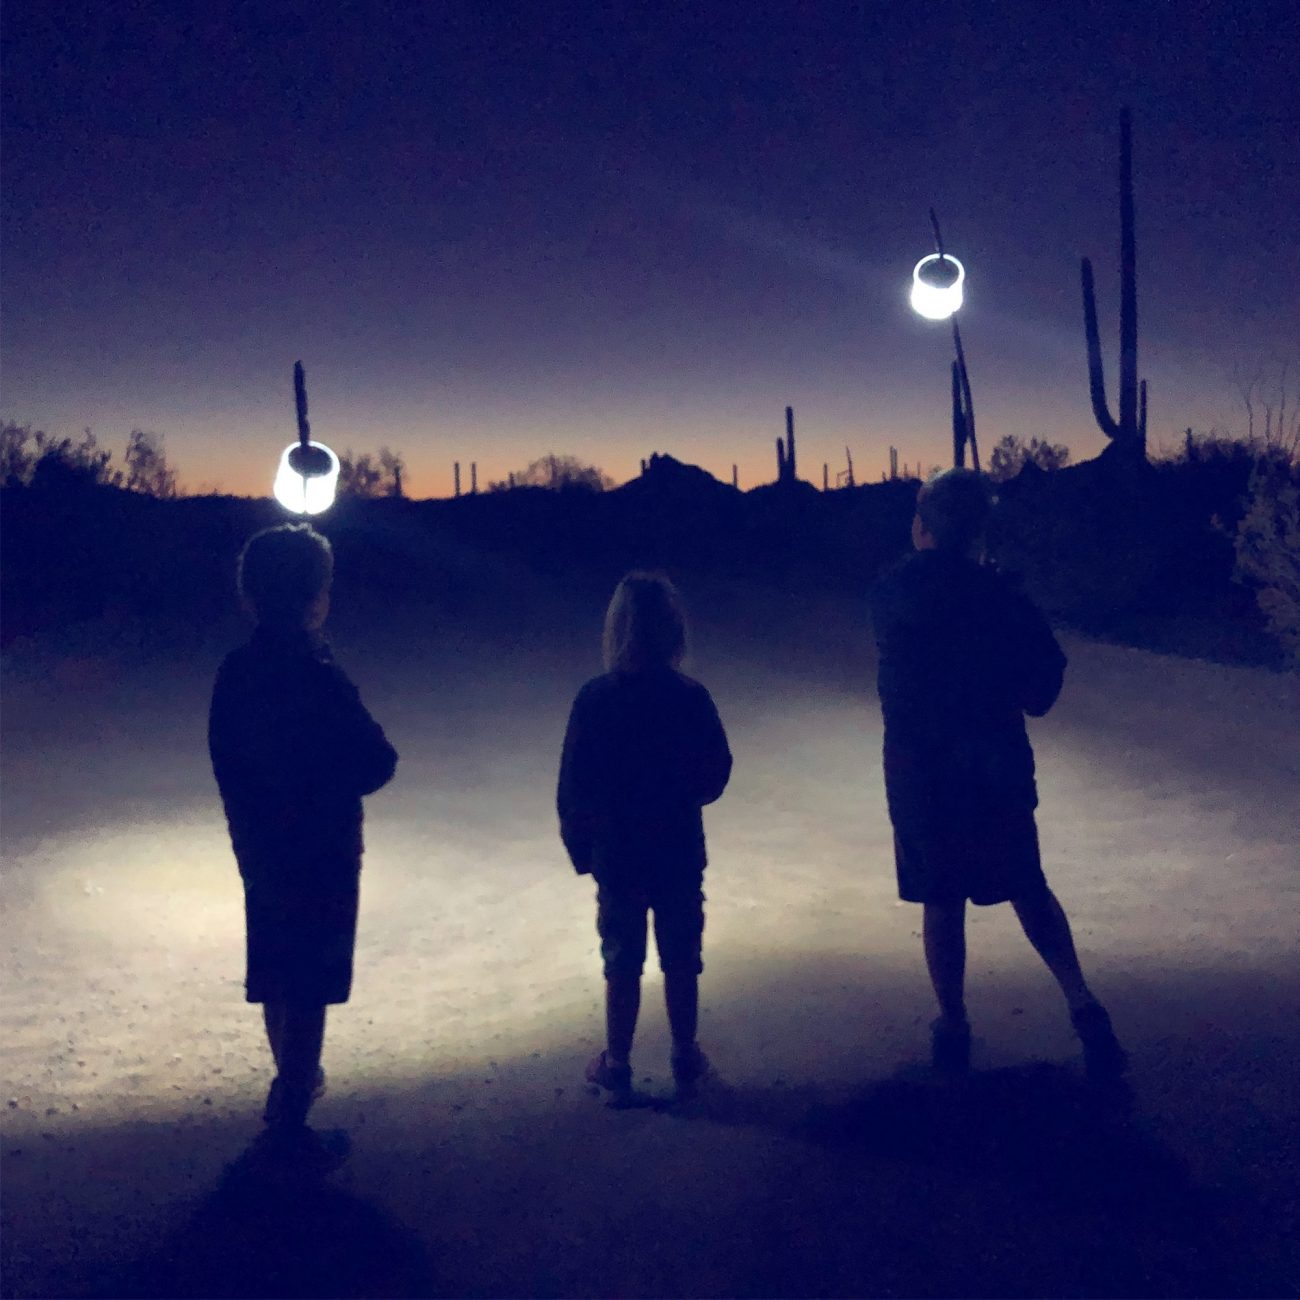 Kids walking with lights at night